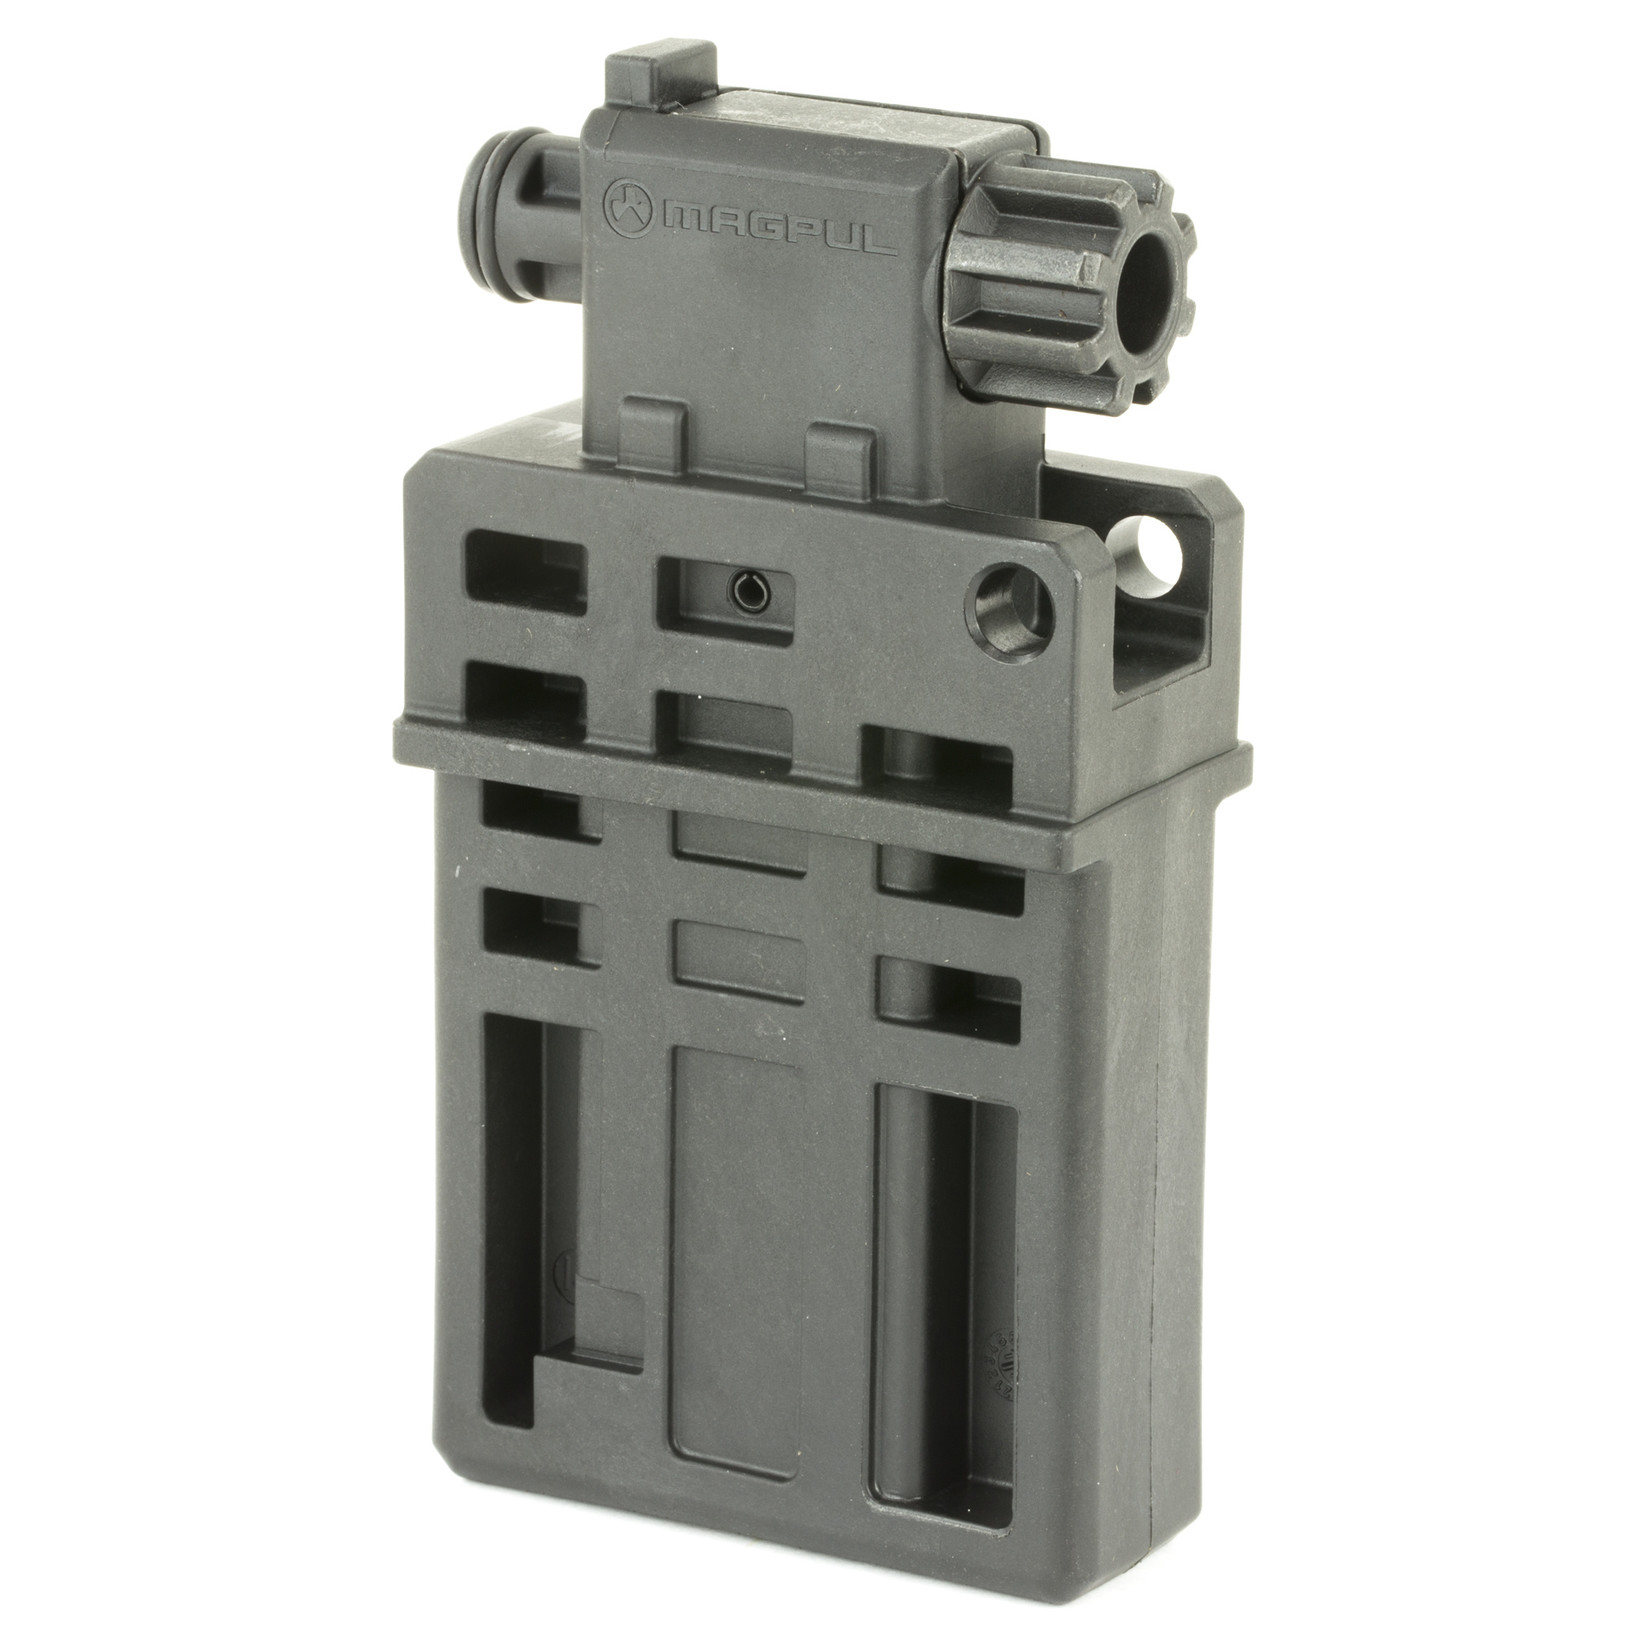 Magpul Magpul Industries, BEV Block, Fits AR-15, Vise Block Tool,Polymer Construction, Black Finish